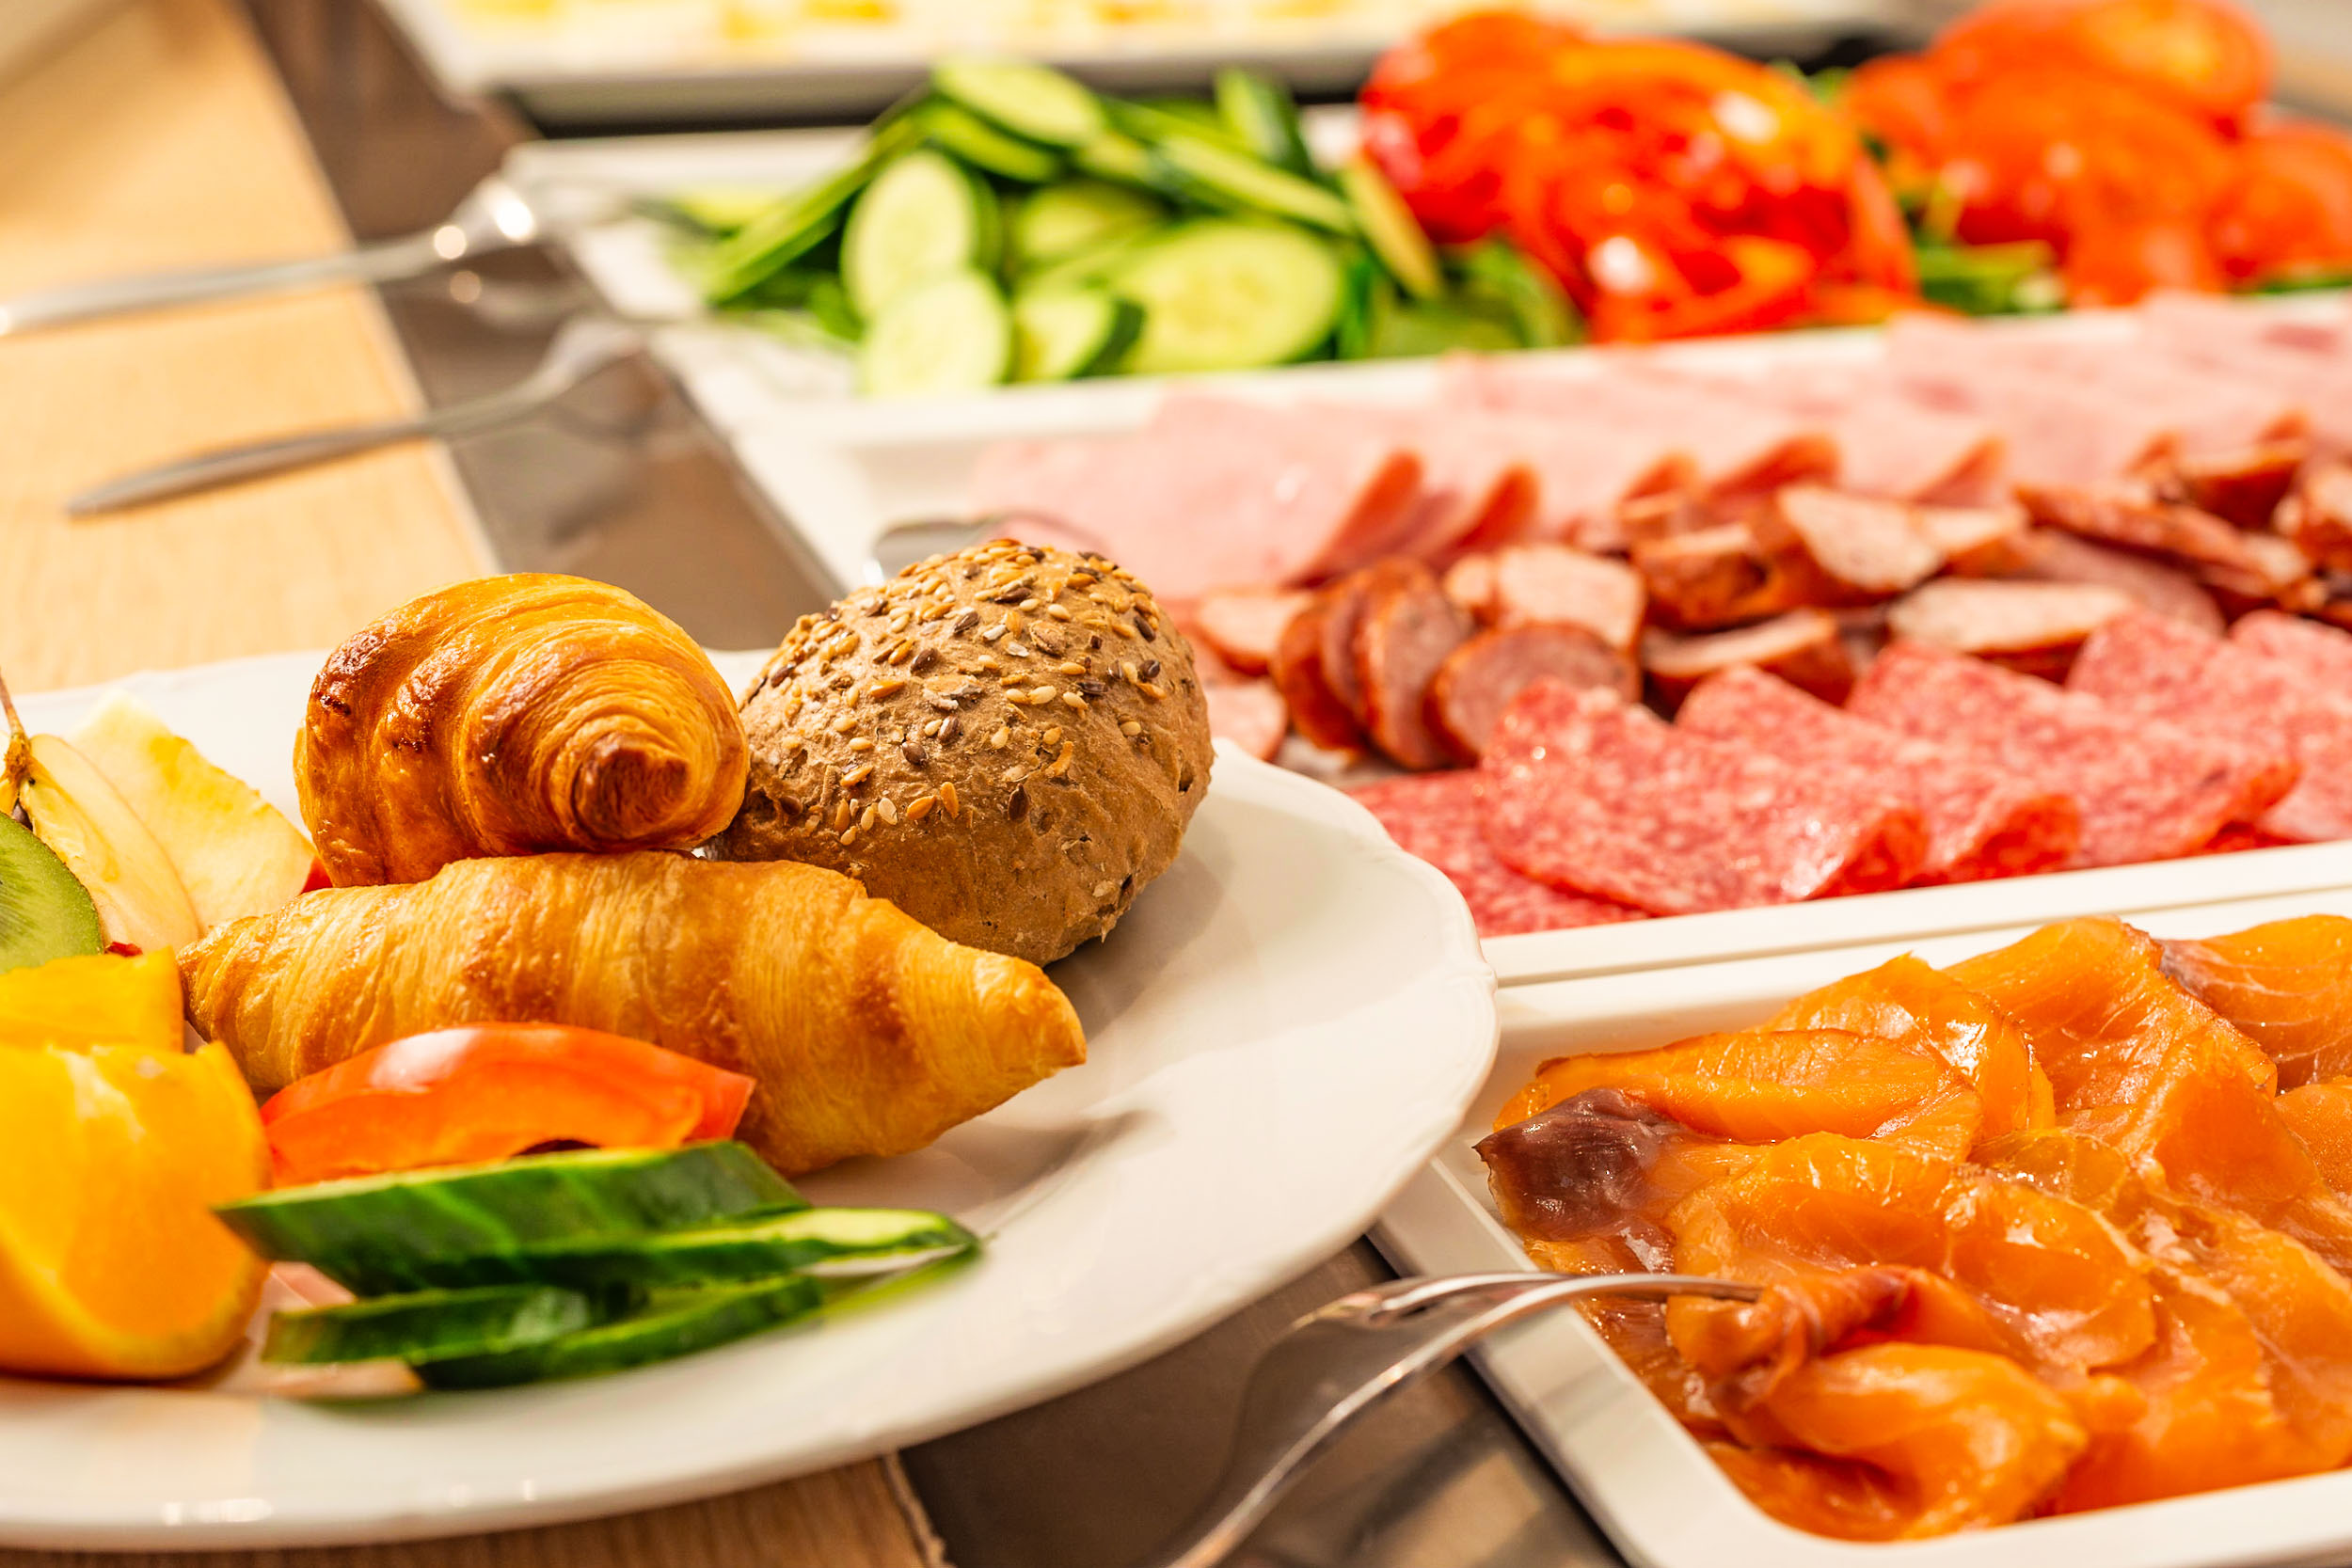 Brreakfast Buffet @ Max's Restaurant